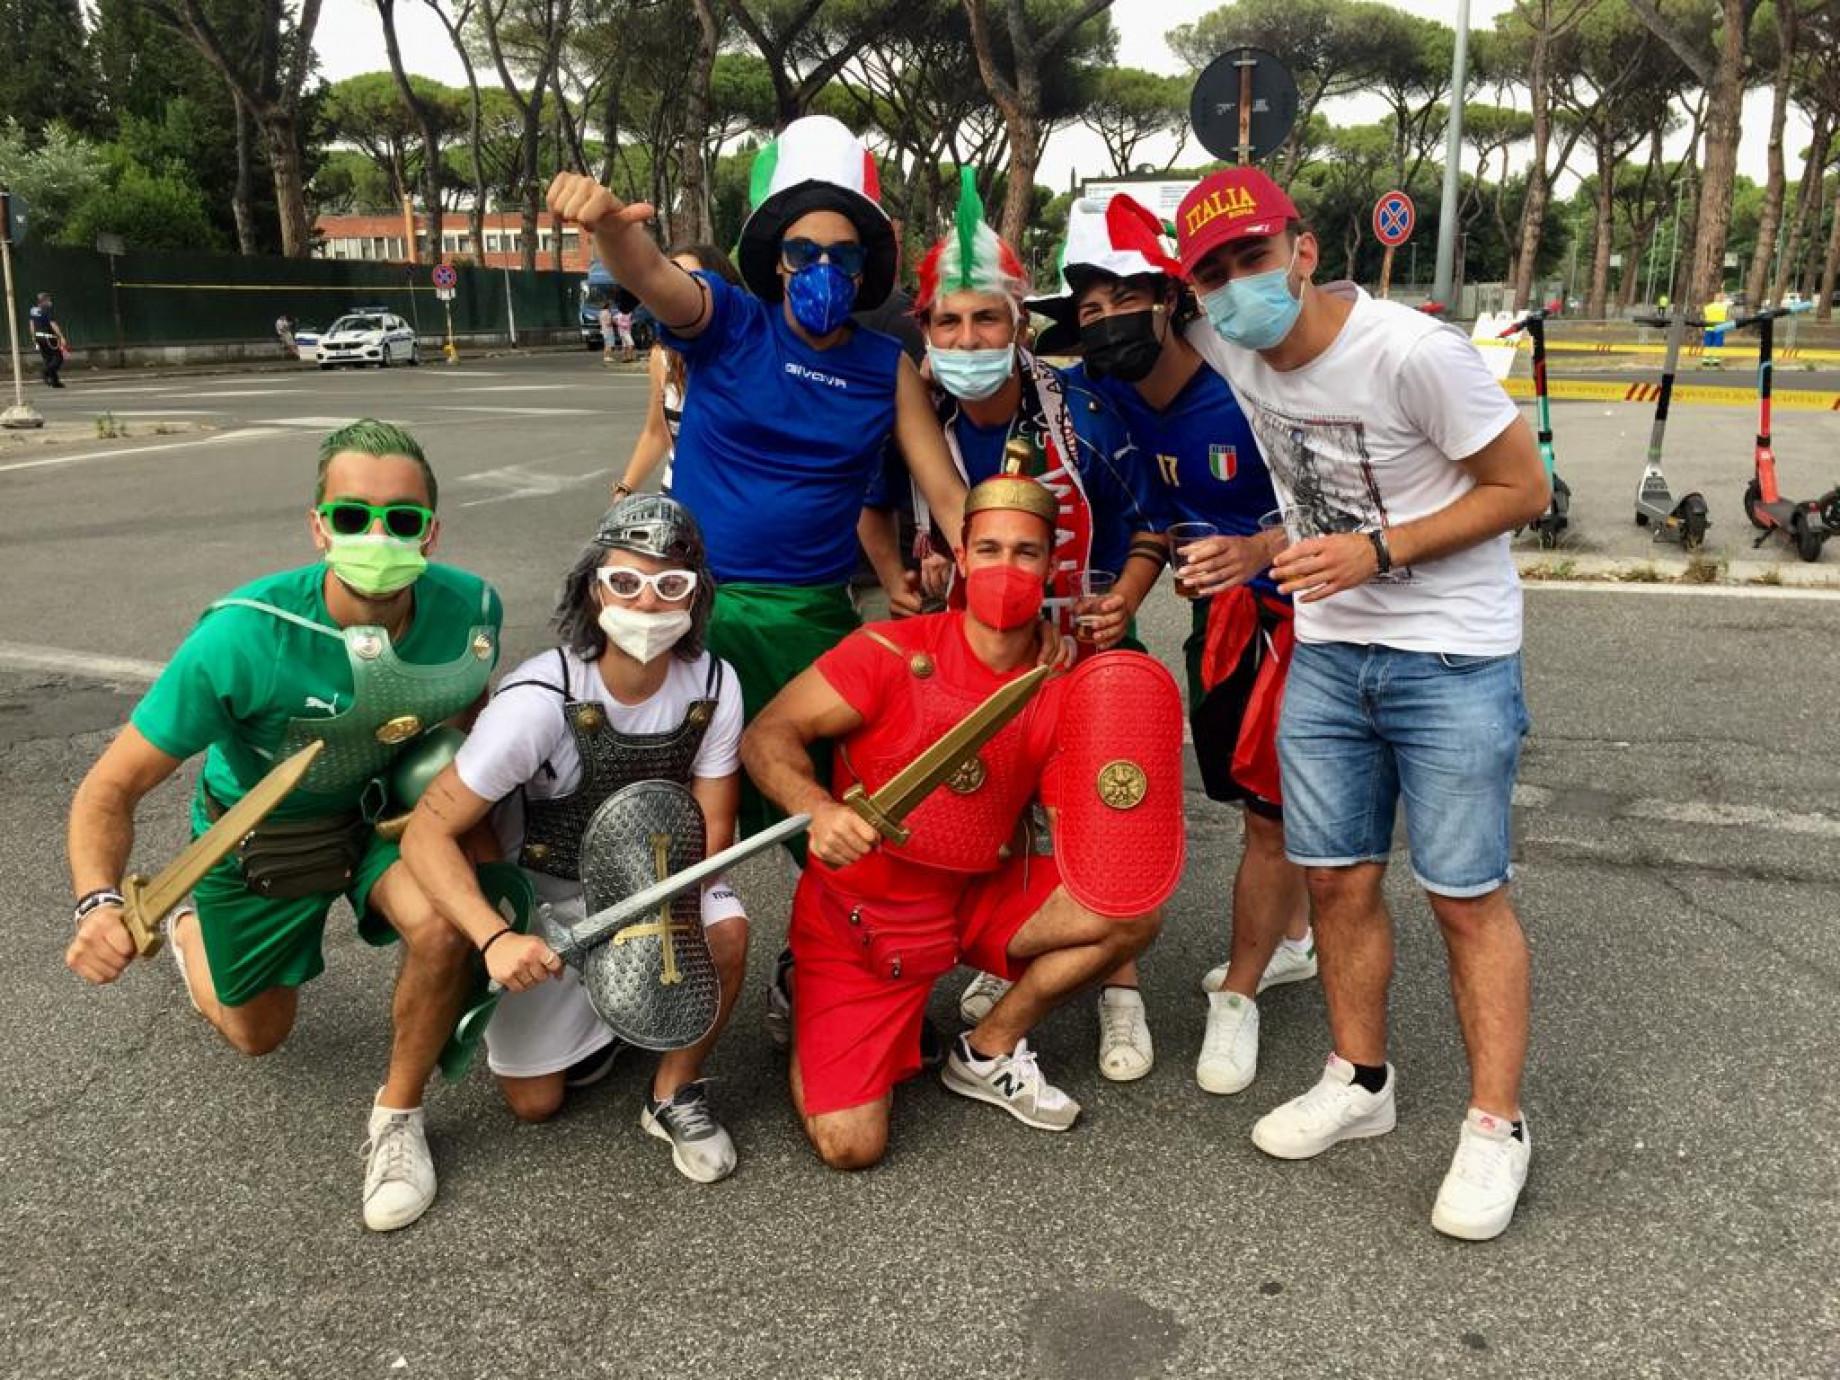 italia-galles-tifosi.jpeg